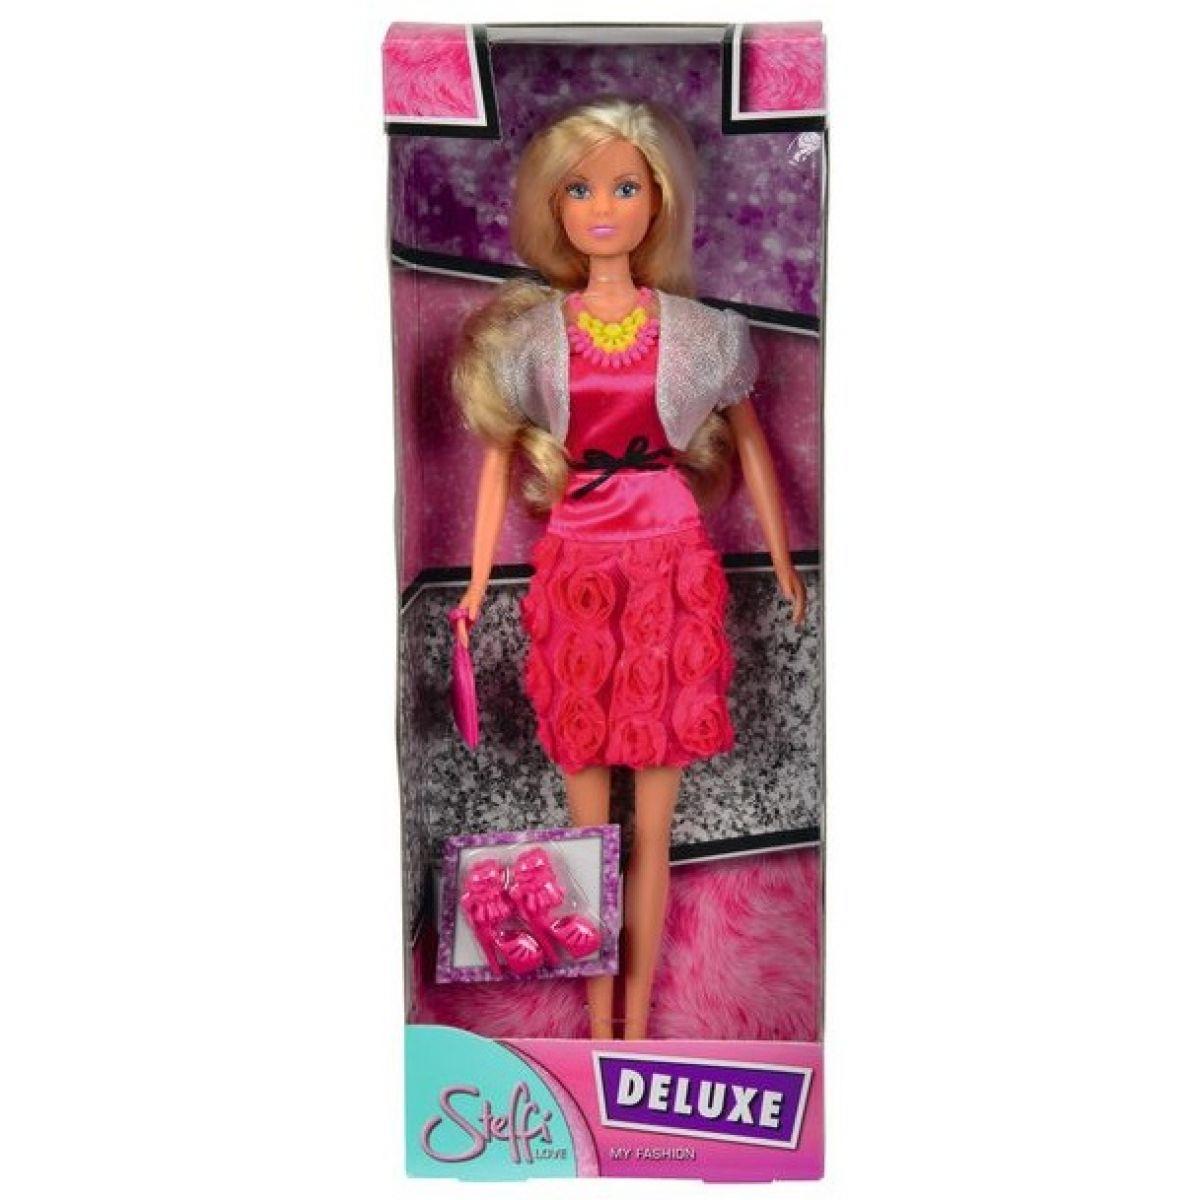 Steffi Love Bábika Deluxe - Ružové topánky